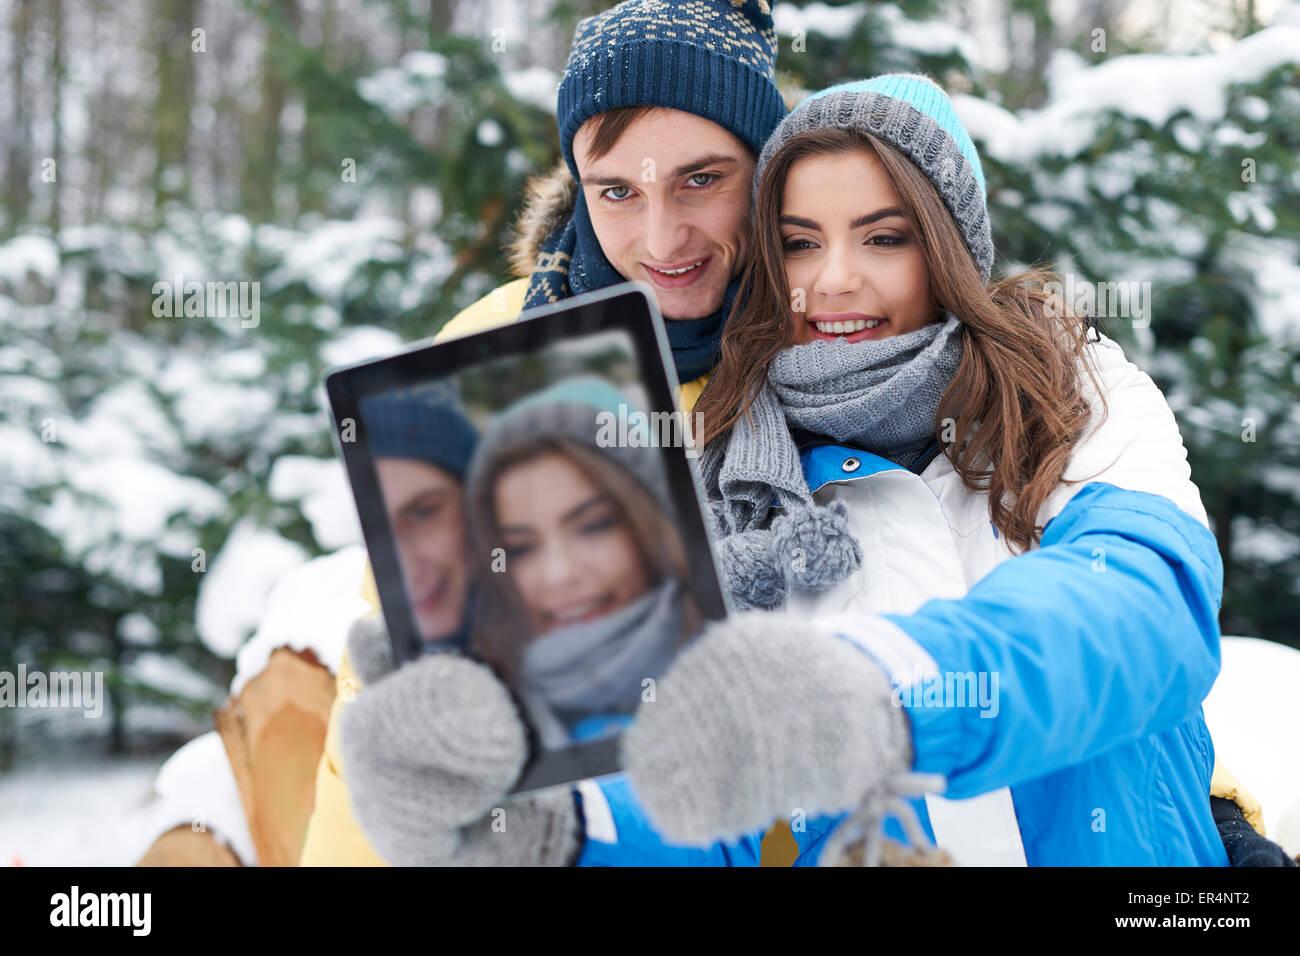 Hey Baby, sourire! Je vais prendre par selfies digital tablet. Debica, Pologne Photo Stock